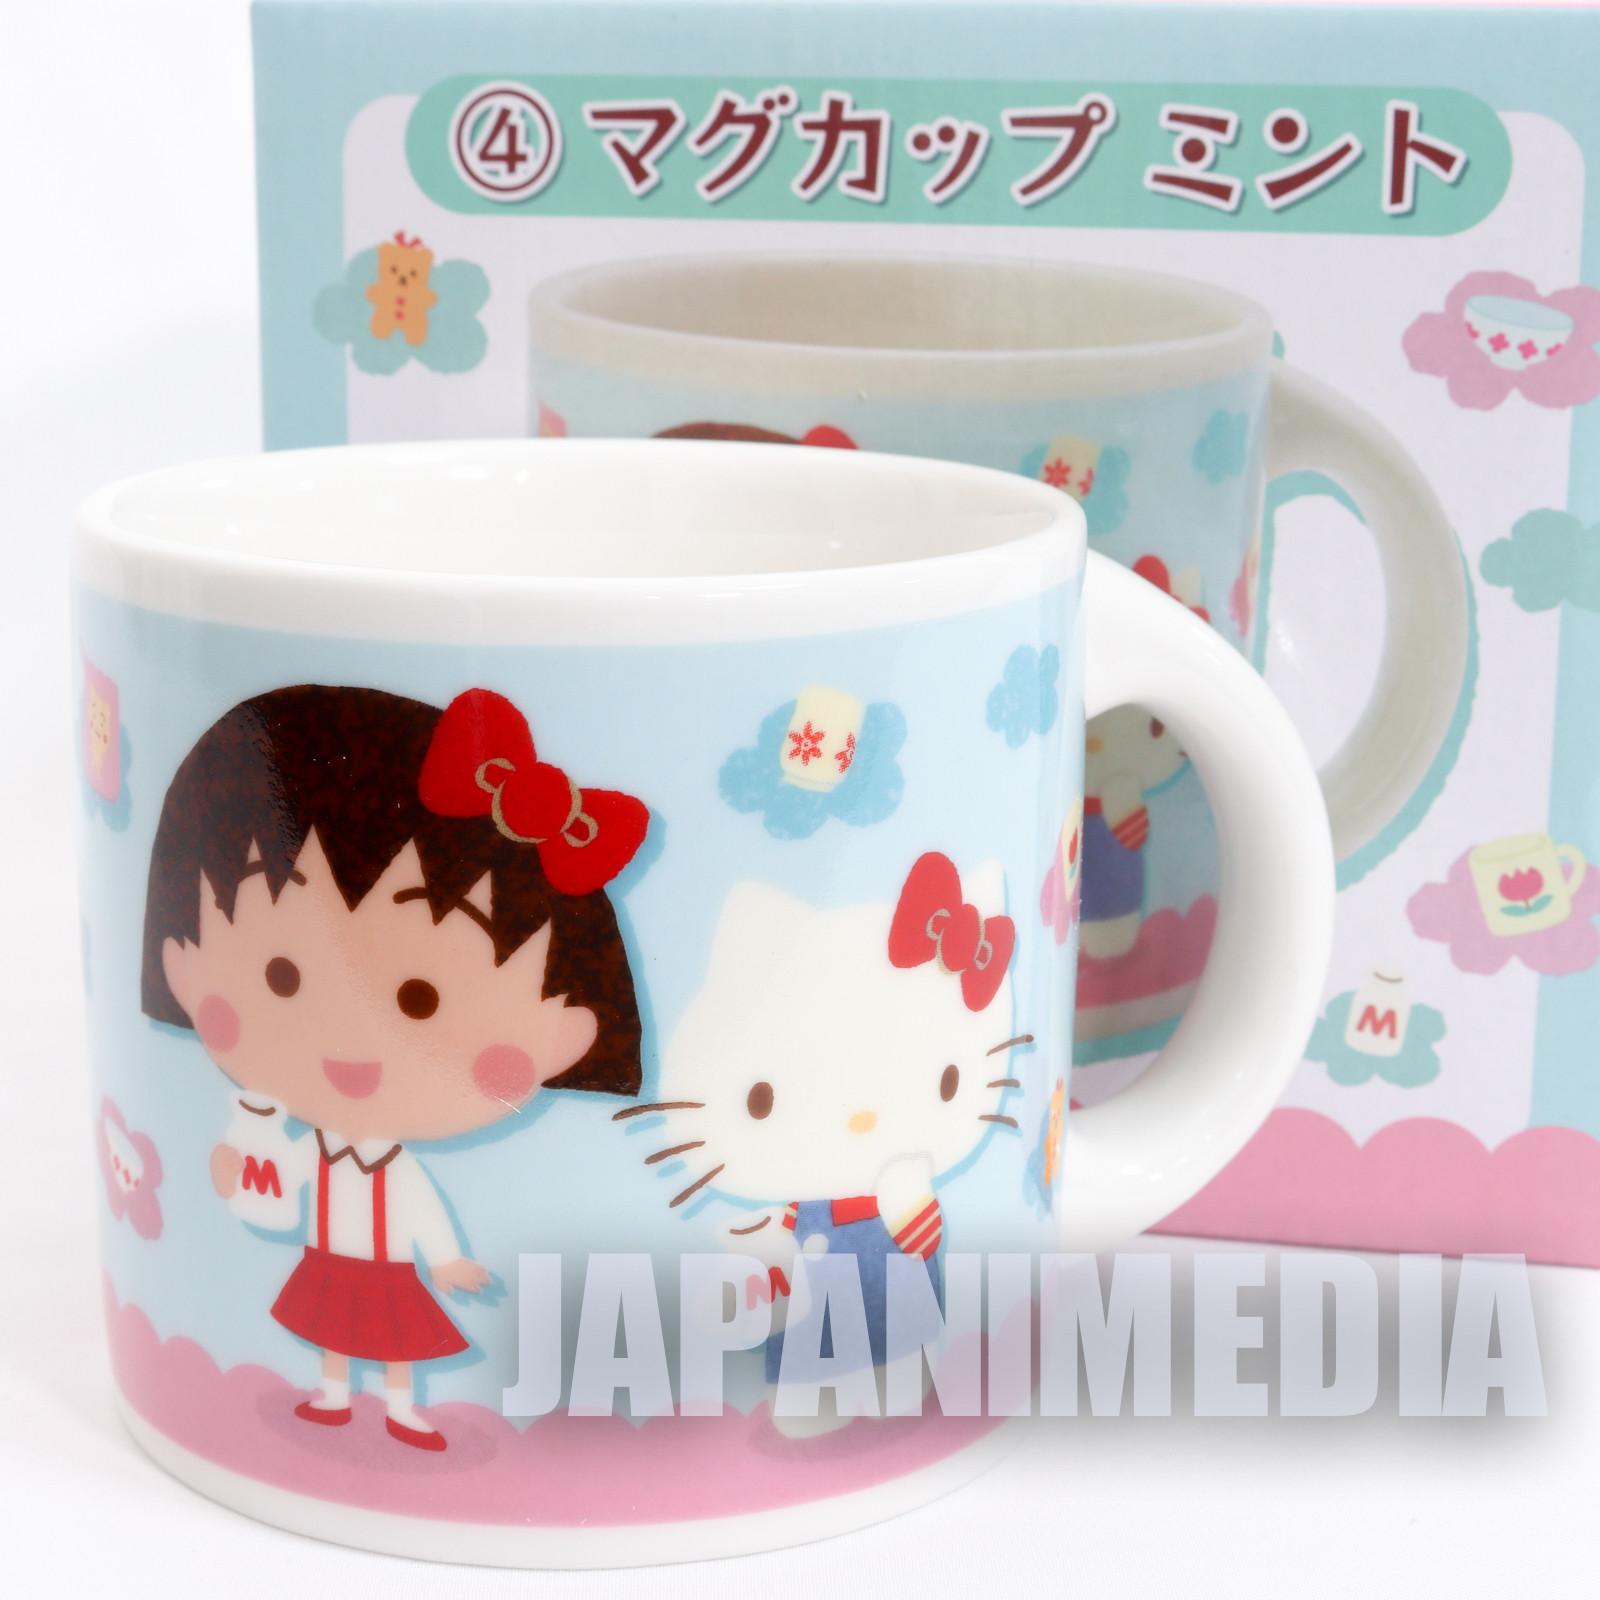 Chibi Maruko Chan x Hello Kitty Mug Sanrio JAPAN ANIME